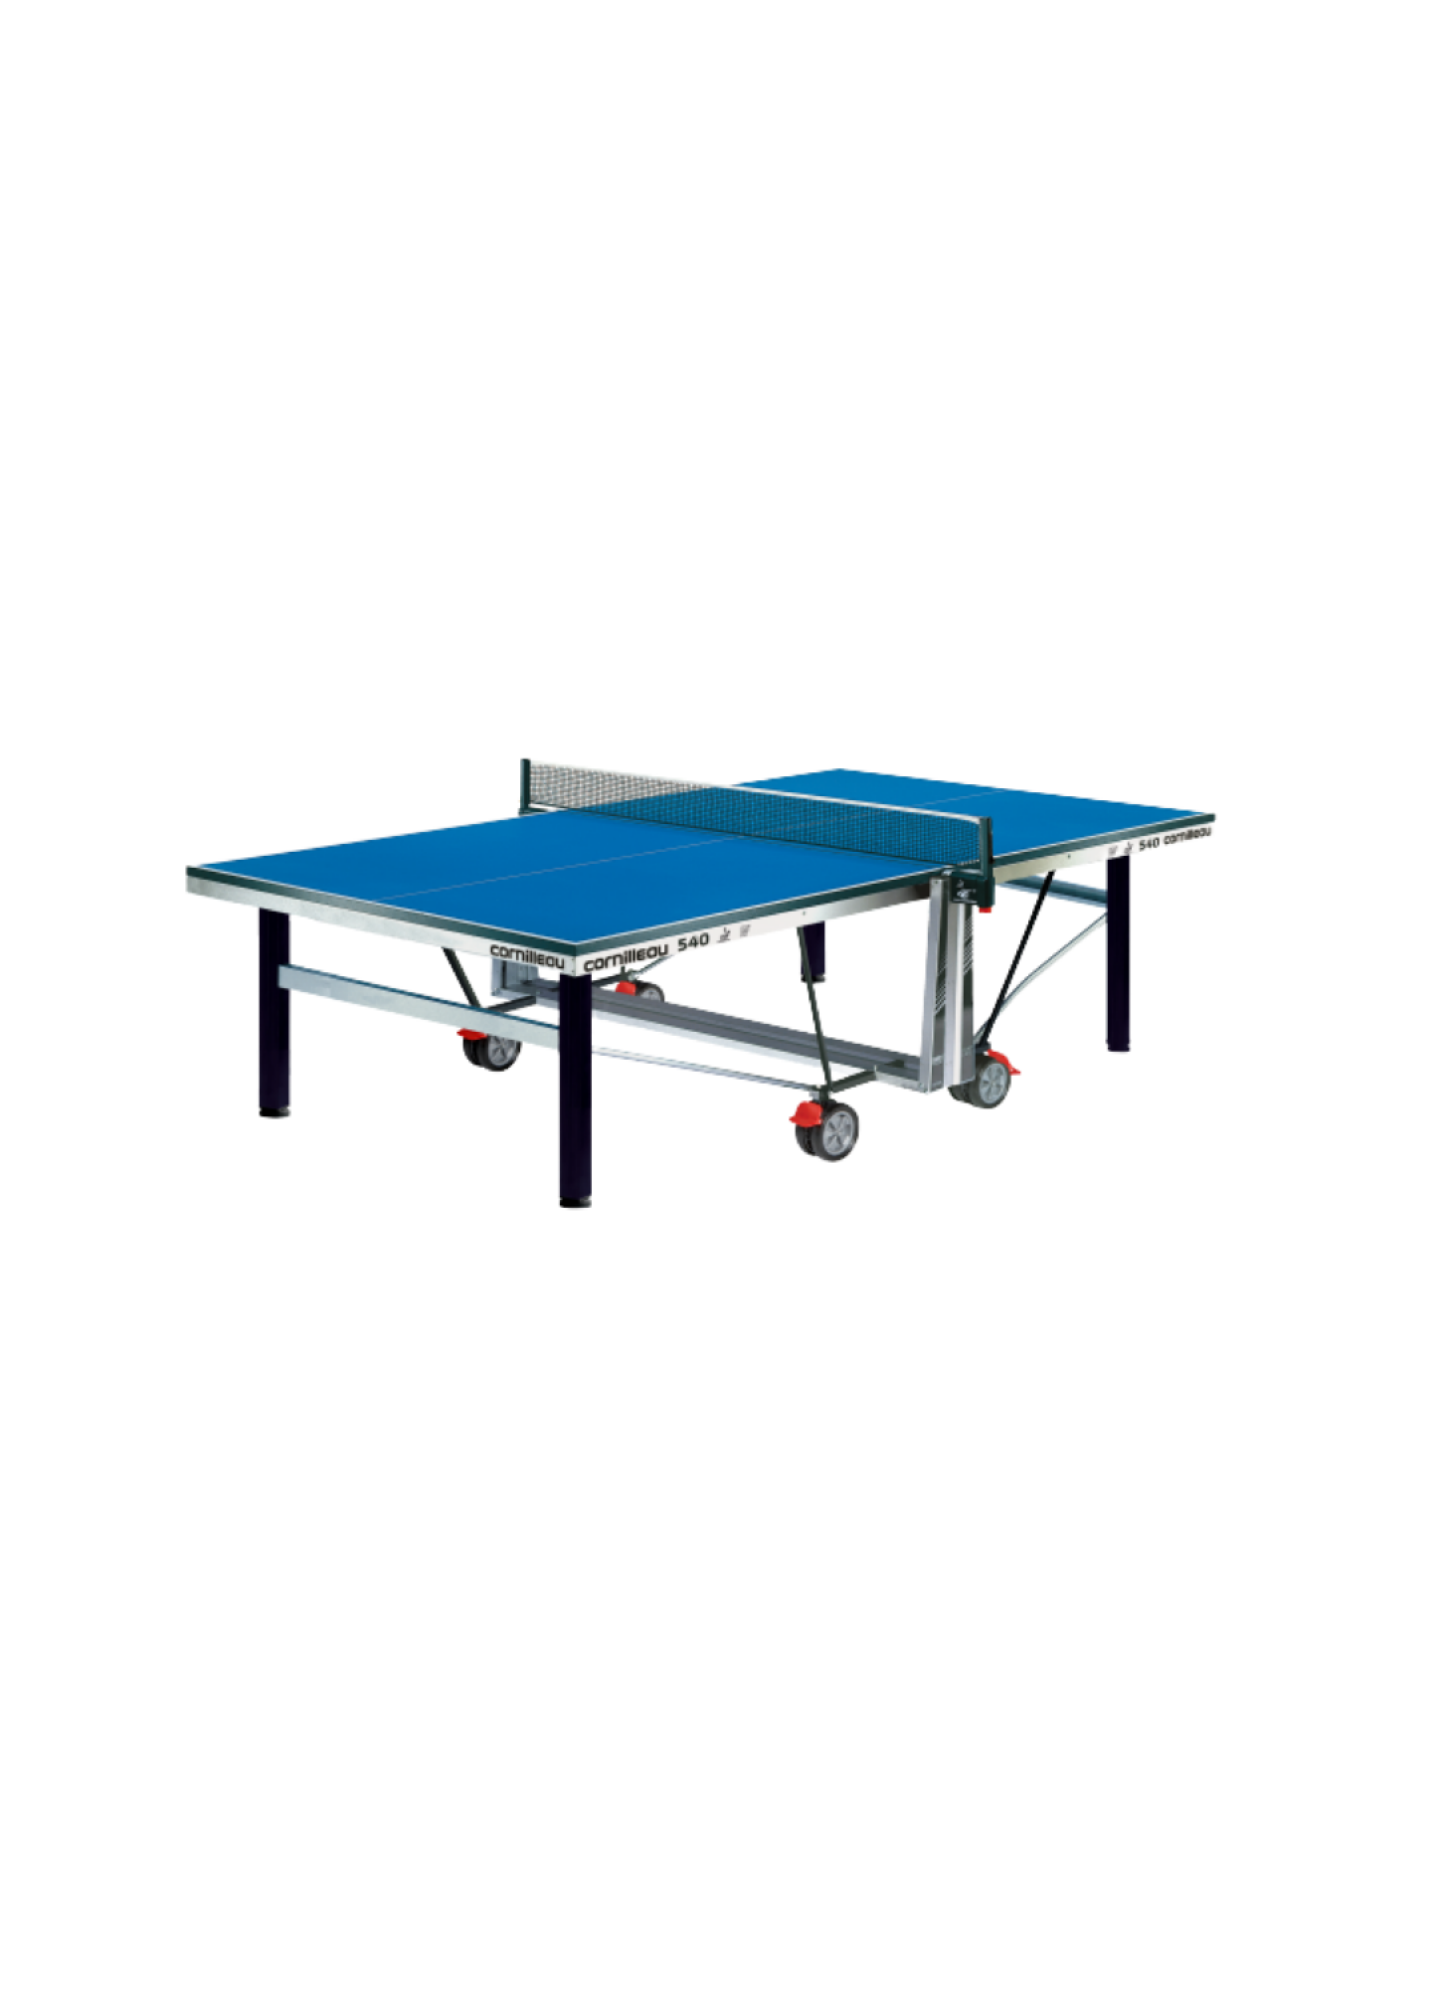 CORNILLEAU 540 ITTF INDOOR TABLE TENNIS